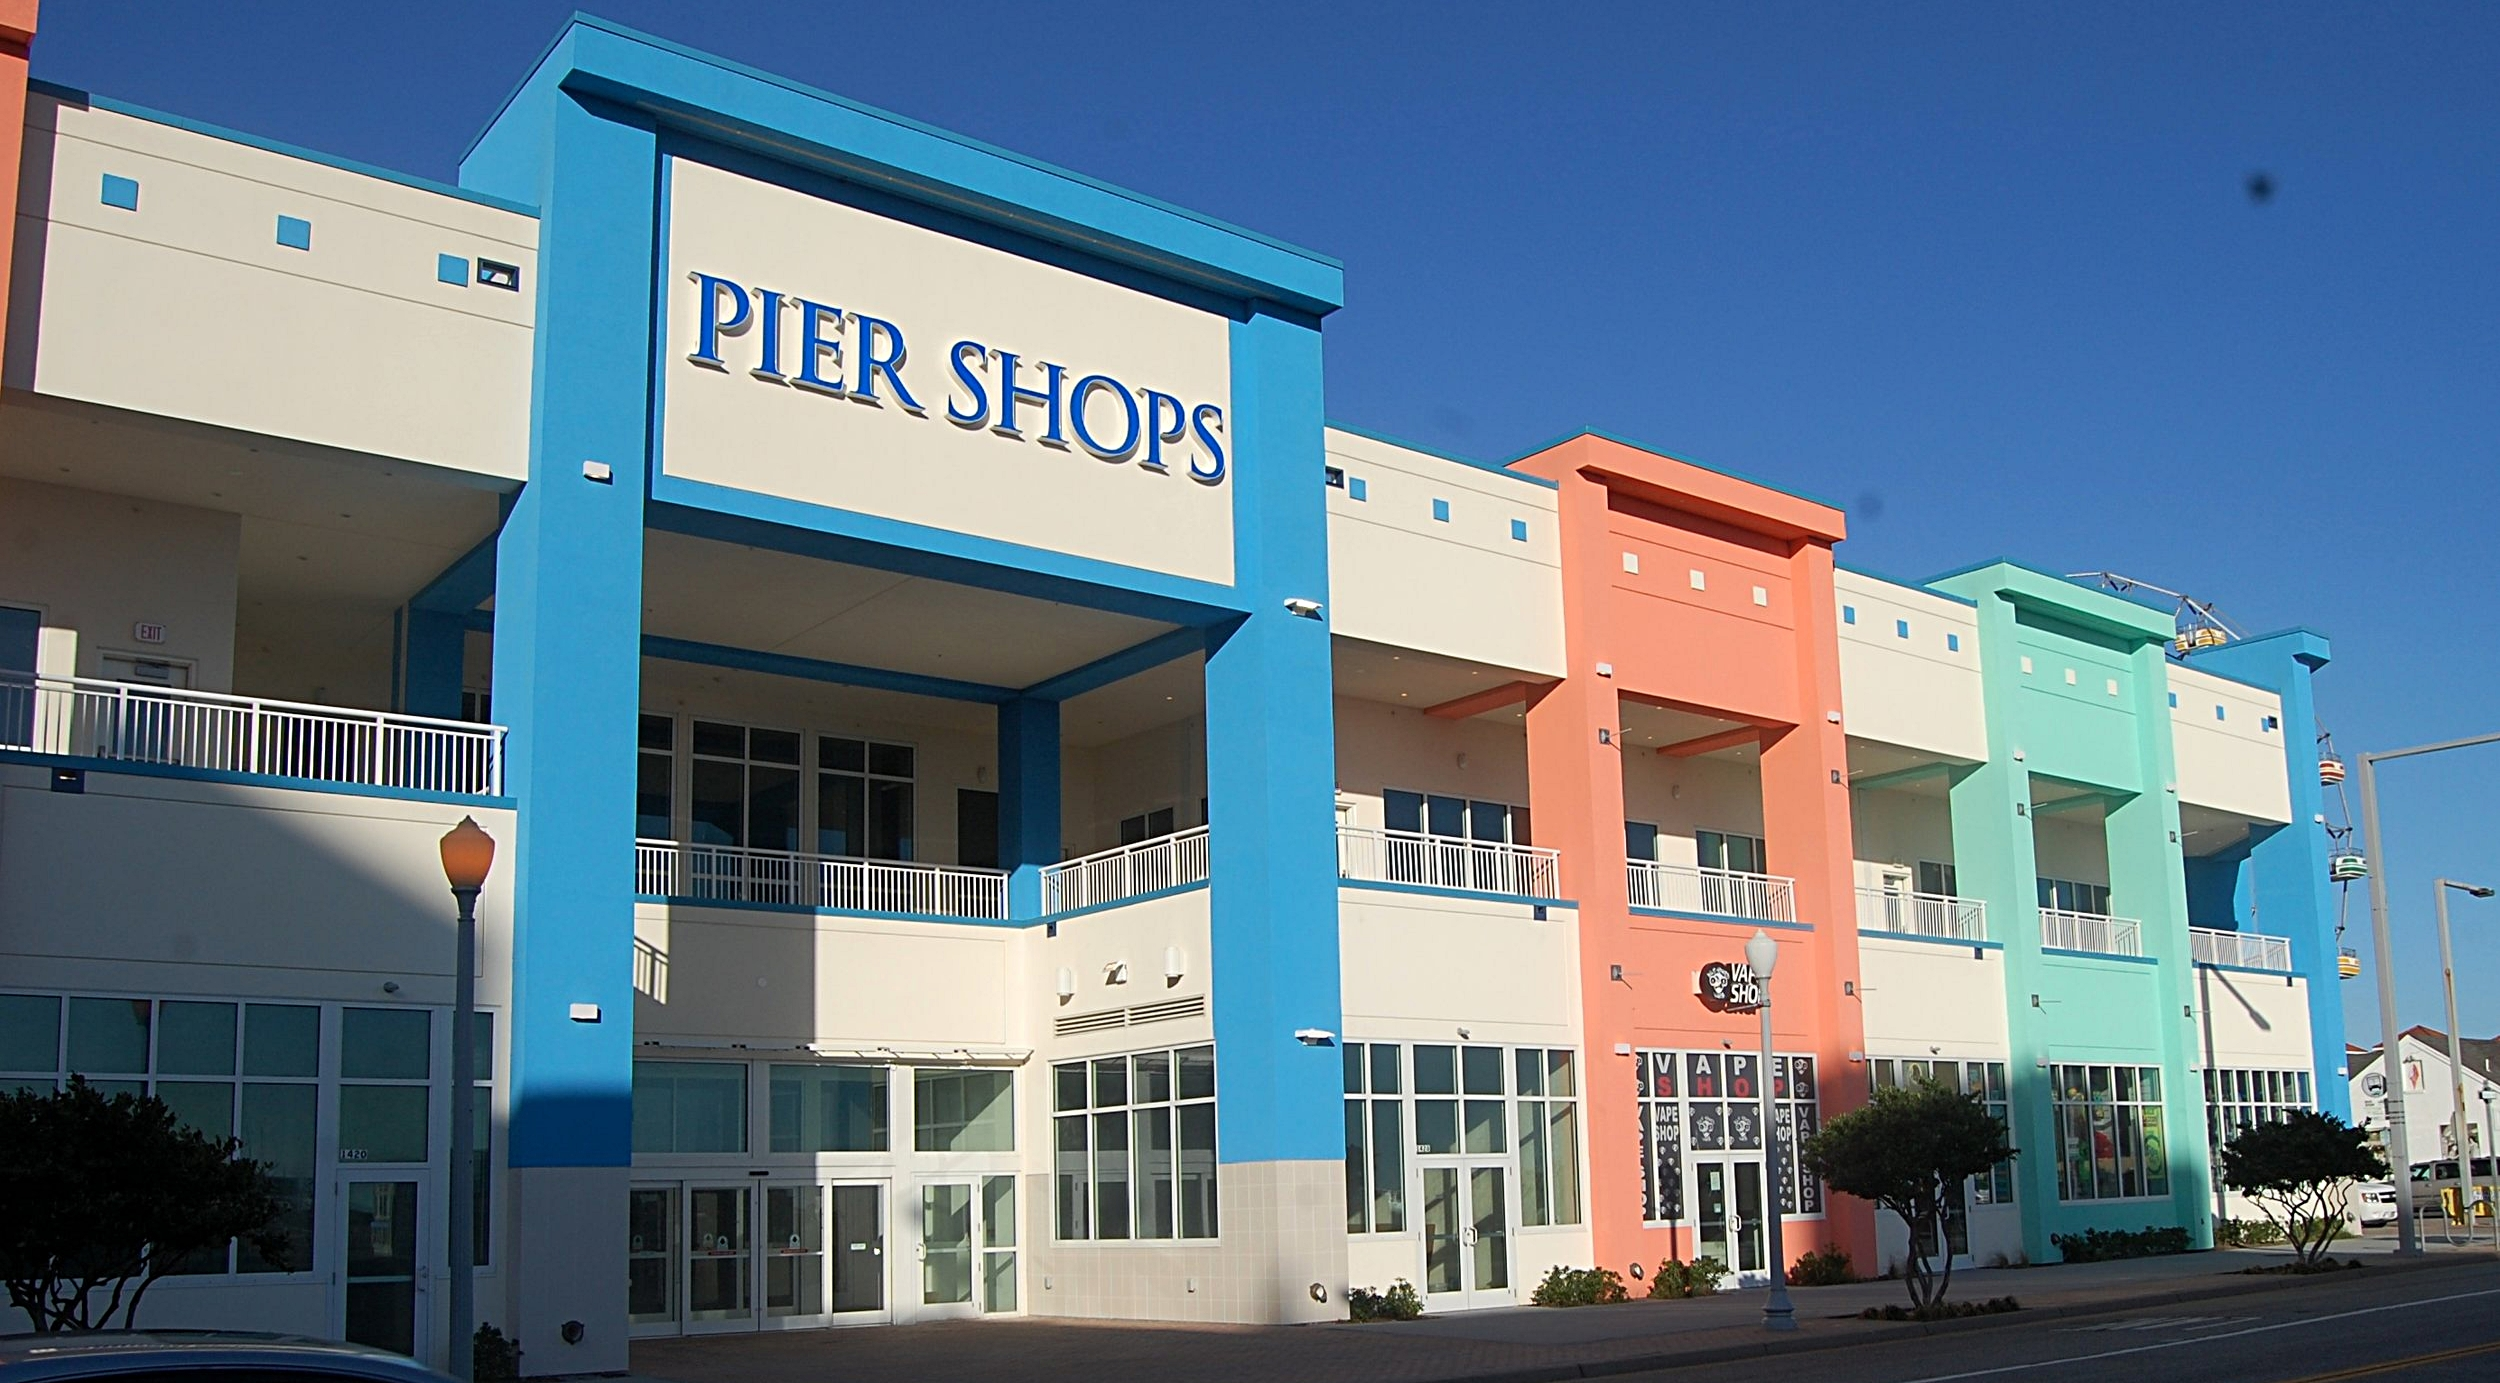 Pier Shops at 15th #commercial#shopping#retail#tourism#upscale#fun#social#VirginiaBeach